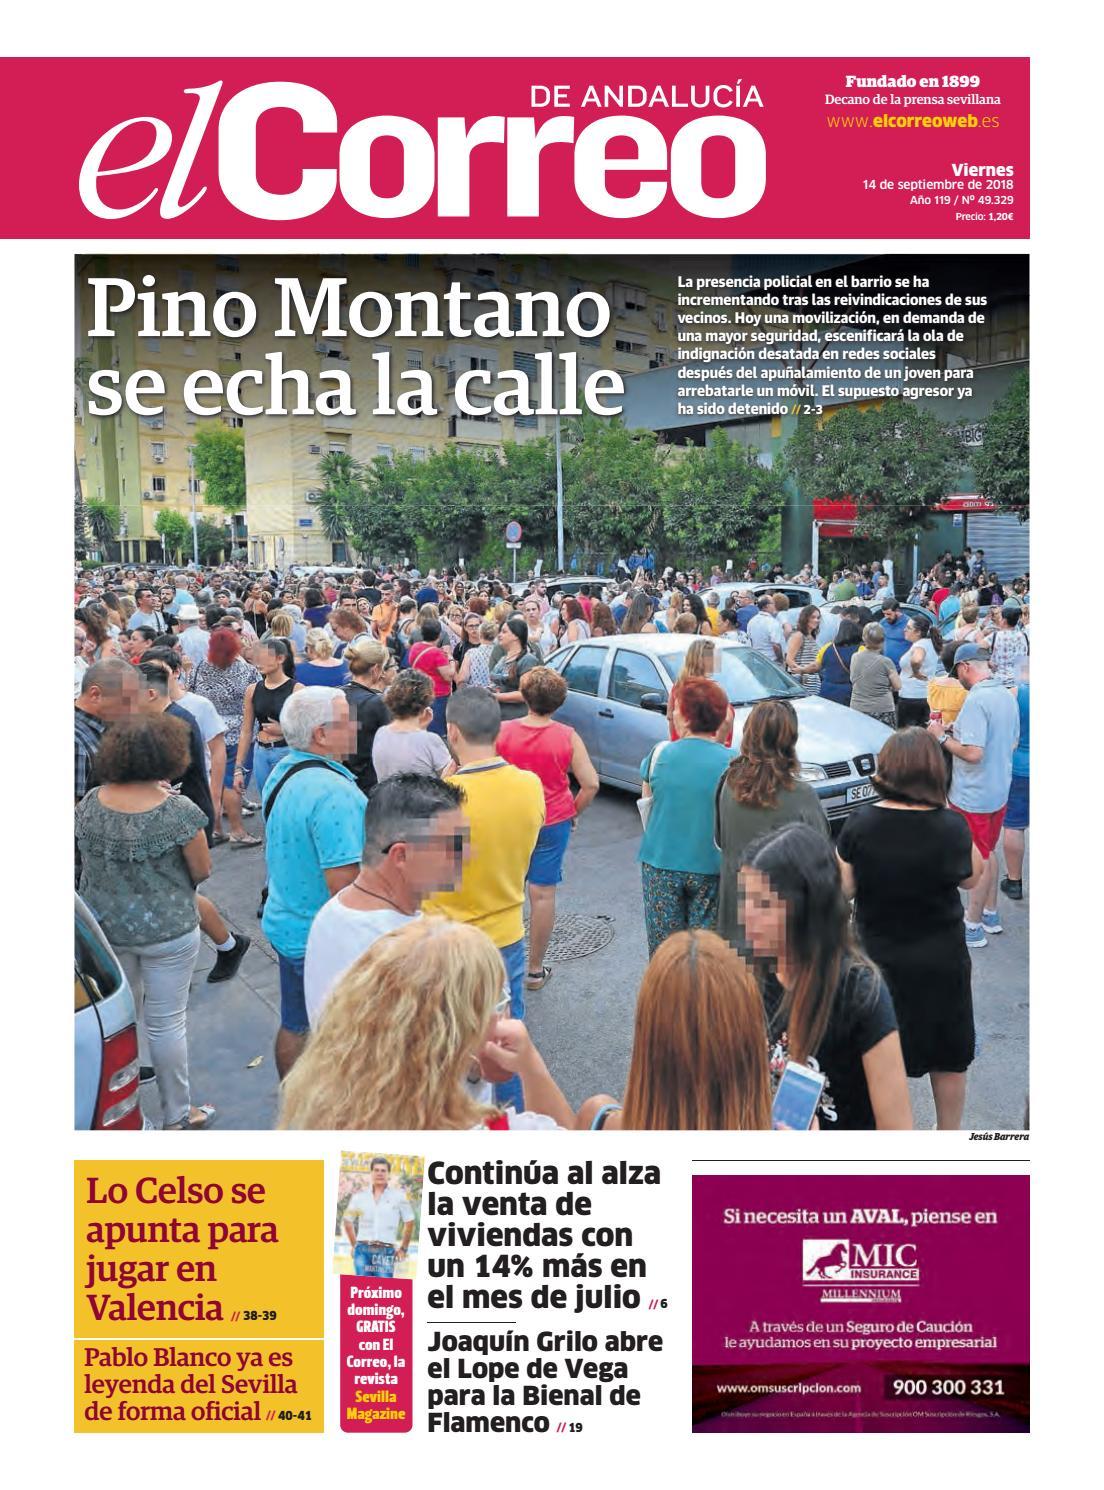 efc2950e1b0e 14.09.2018 El Correo de Andalucía by EL CORREO DE ANDALUCÍA S.L. - issuu